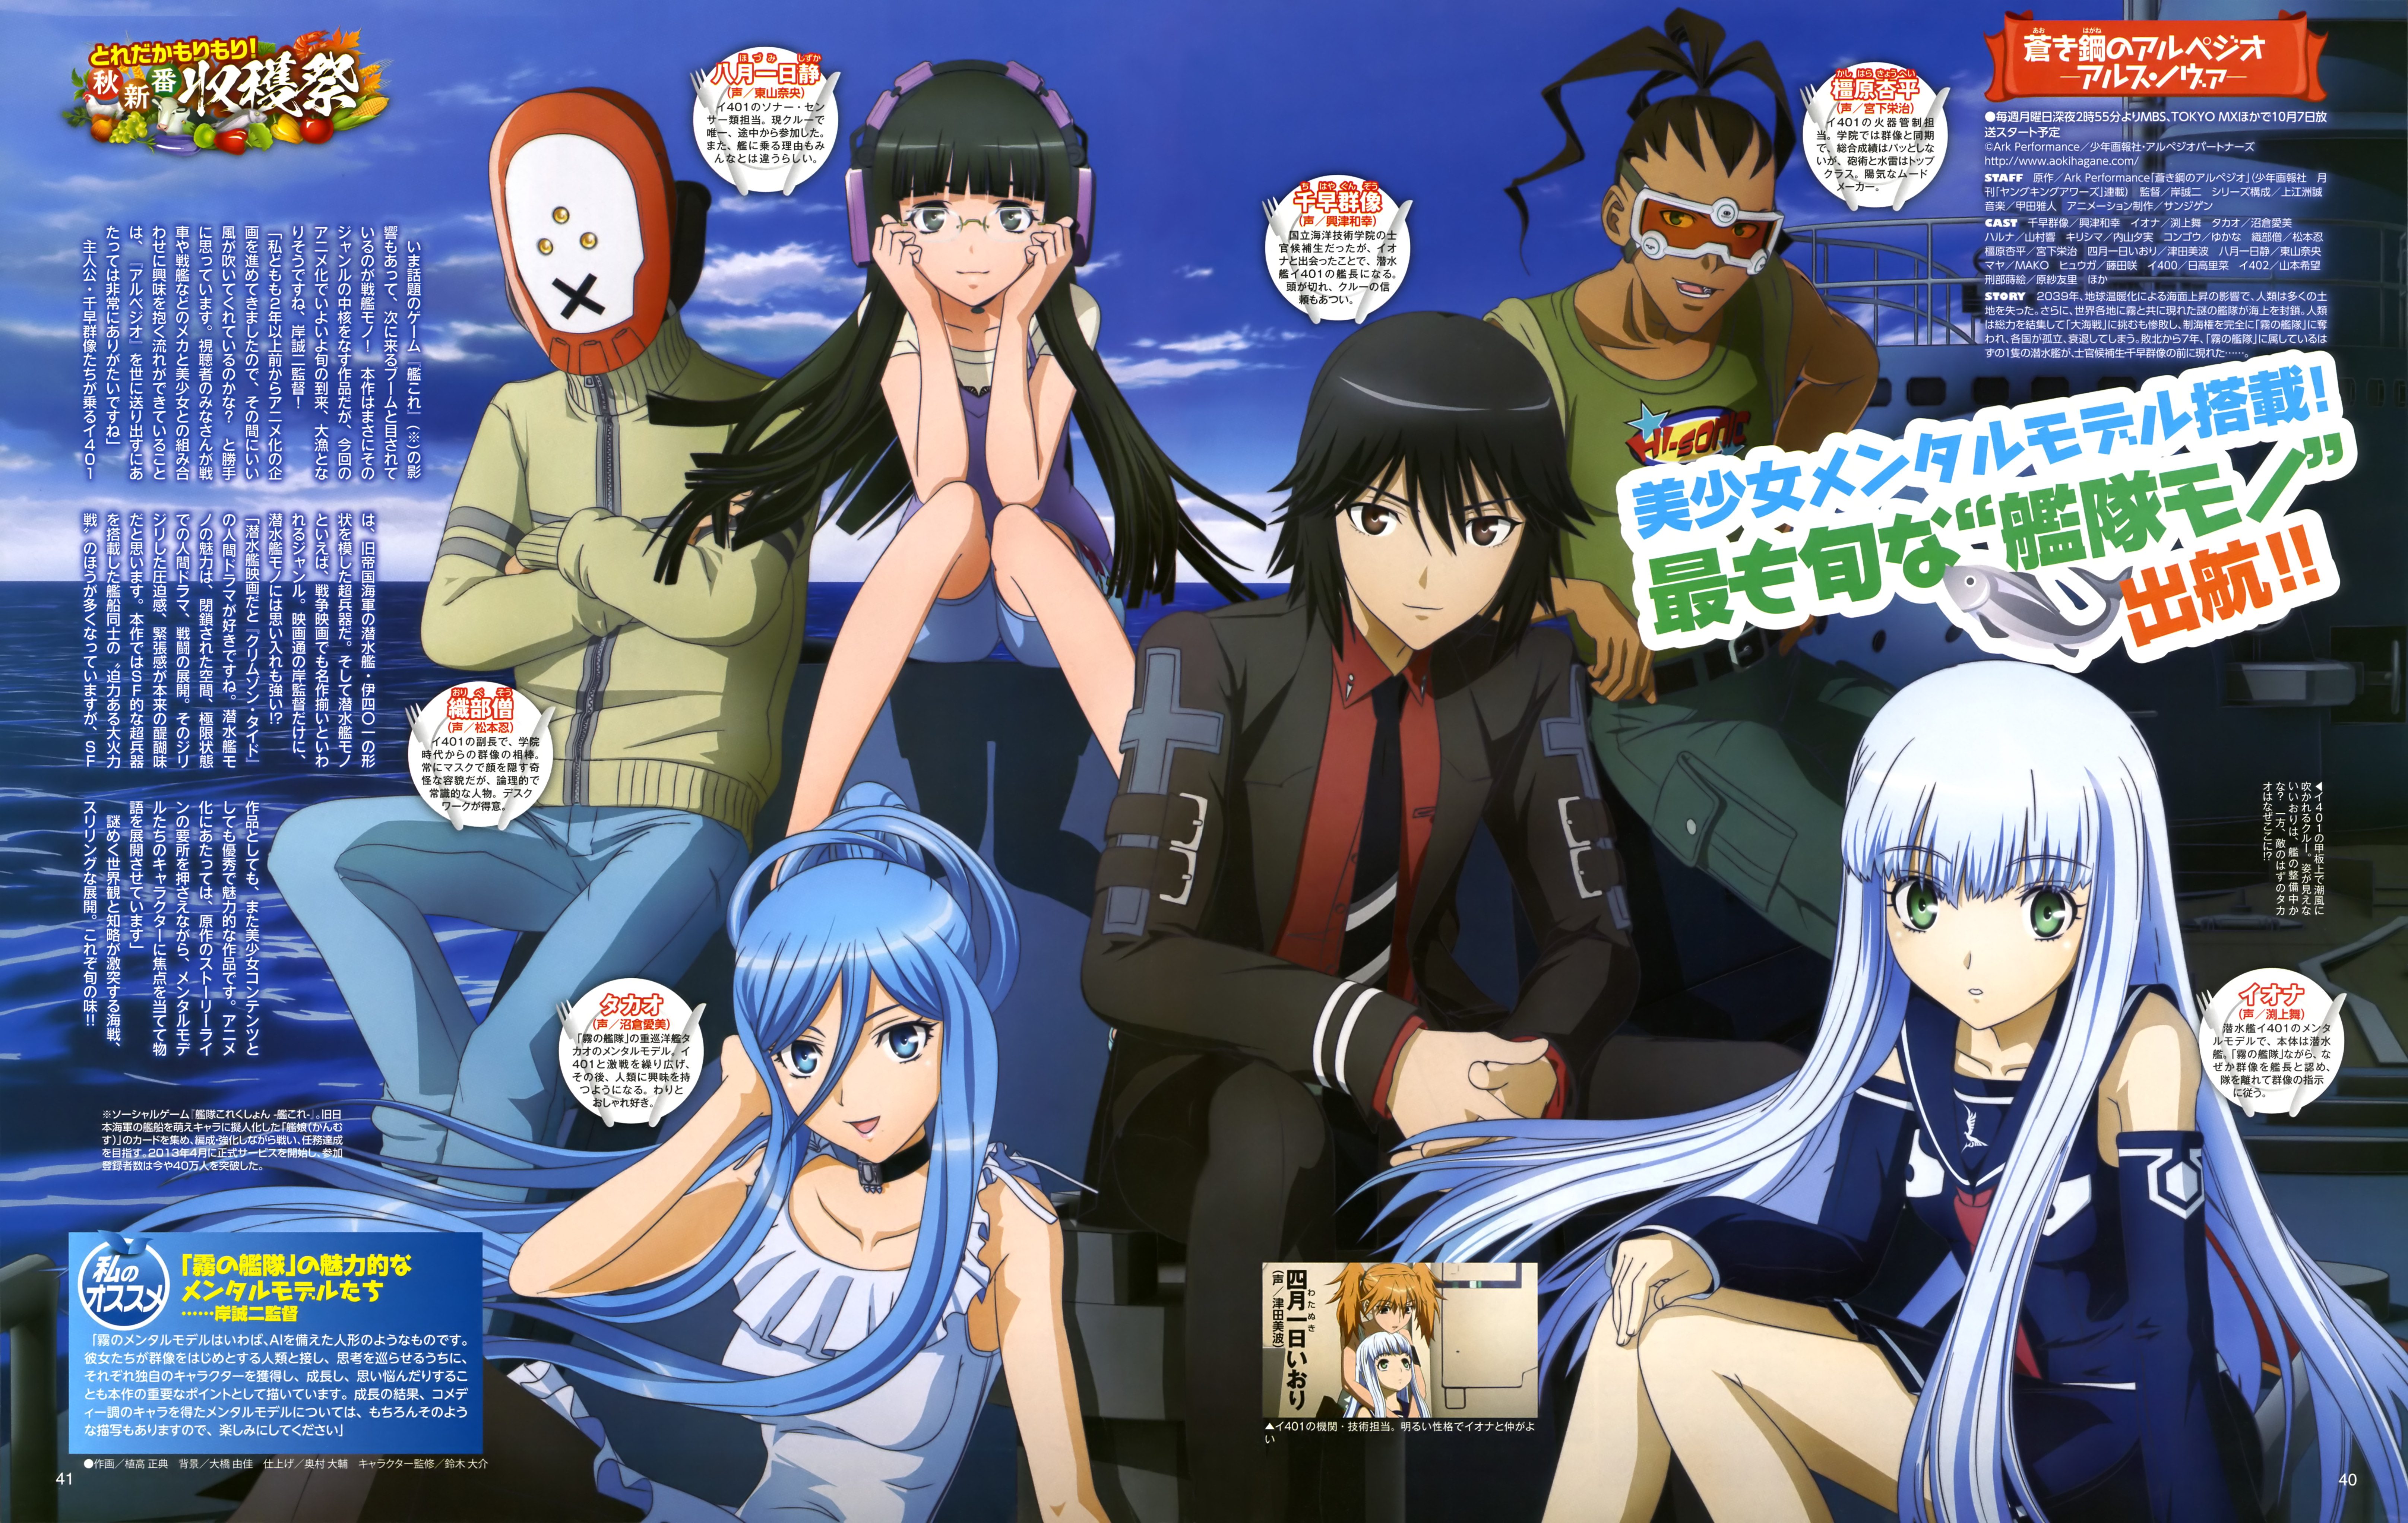 Iona Aoki Hagane No Arpeggio Zerochan Anime Image Board